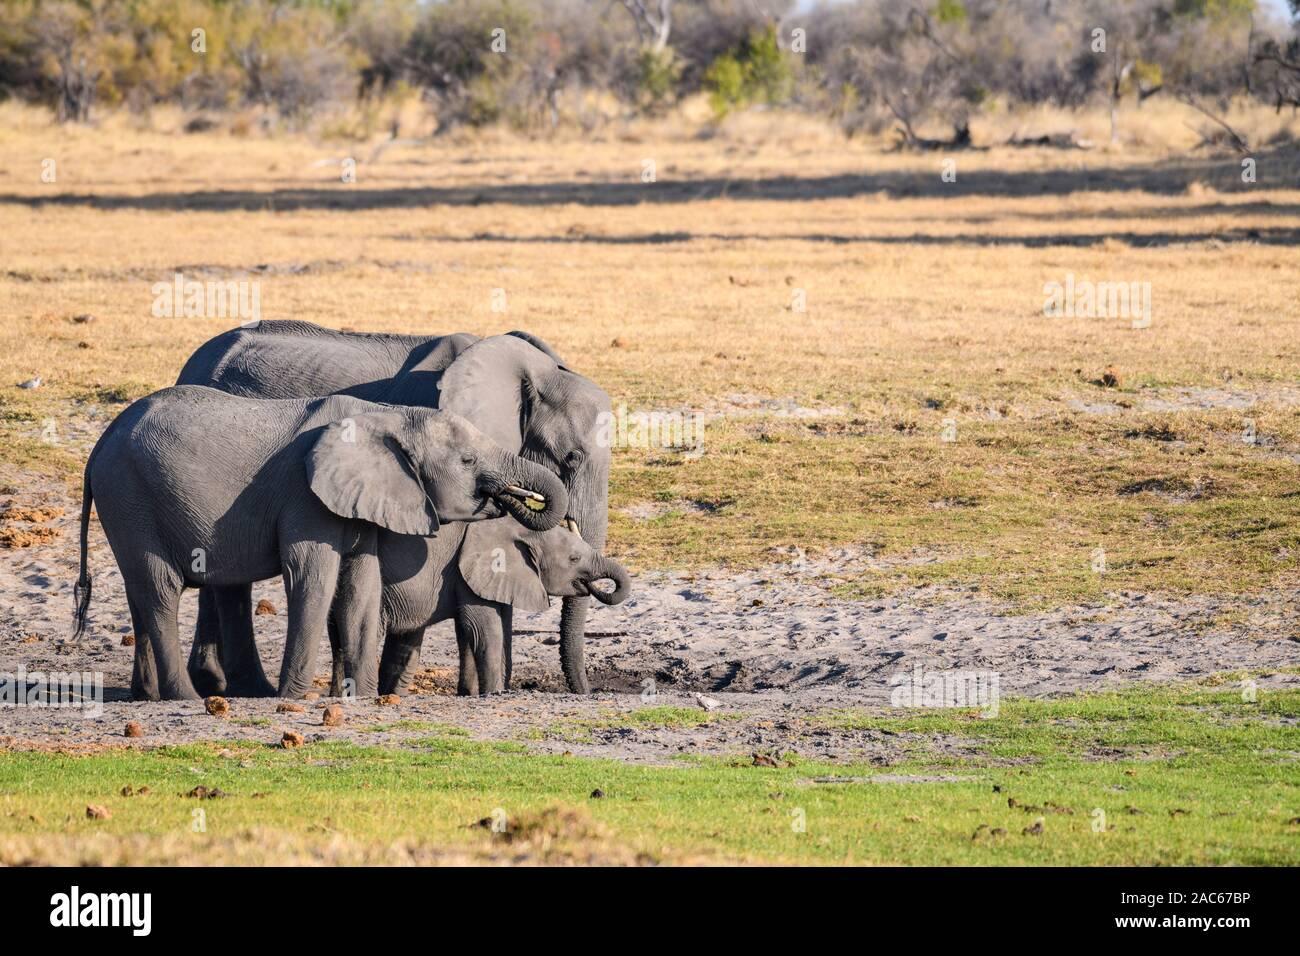 Herde of African Elephant, Loxodonta africana, at a Waterhole, Macatoo, Okavango Delta, Botswana Stockfoto